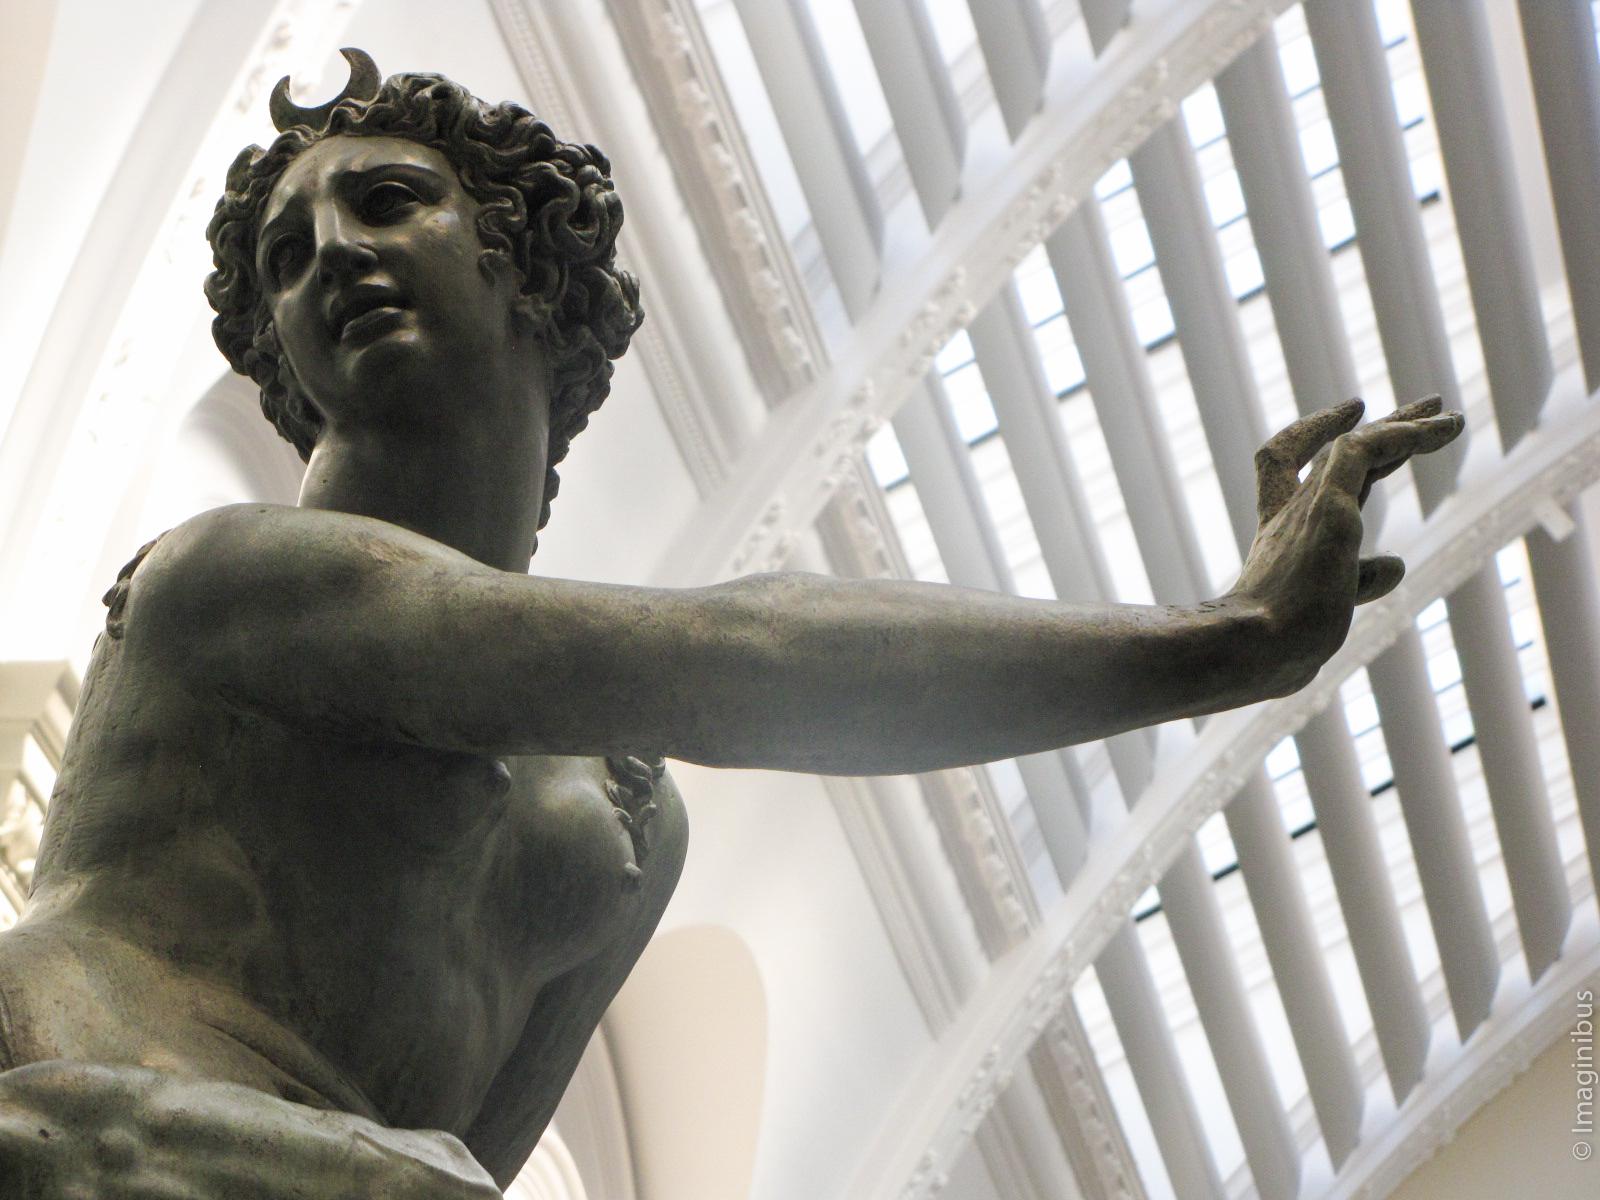 Victoria and Albert Museum, London, Statue